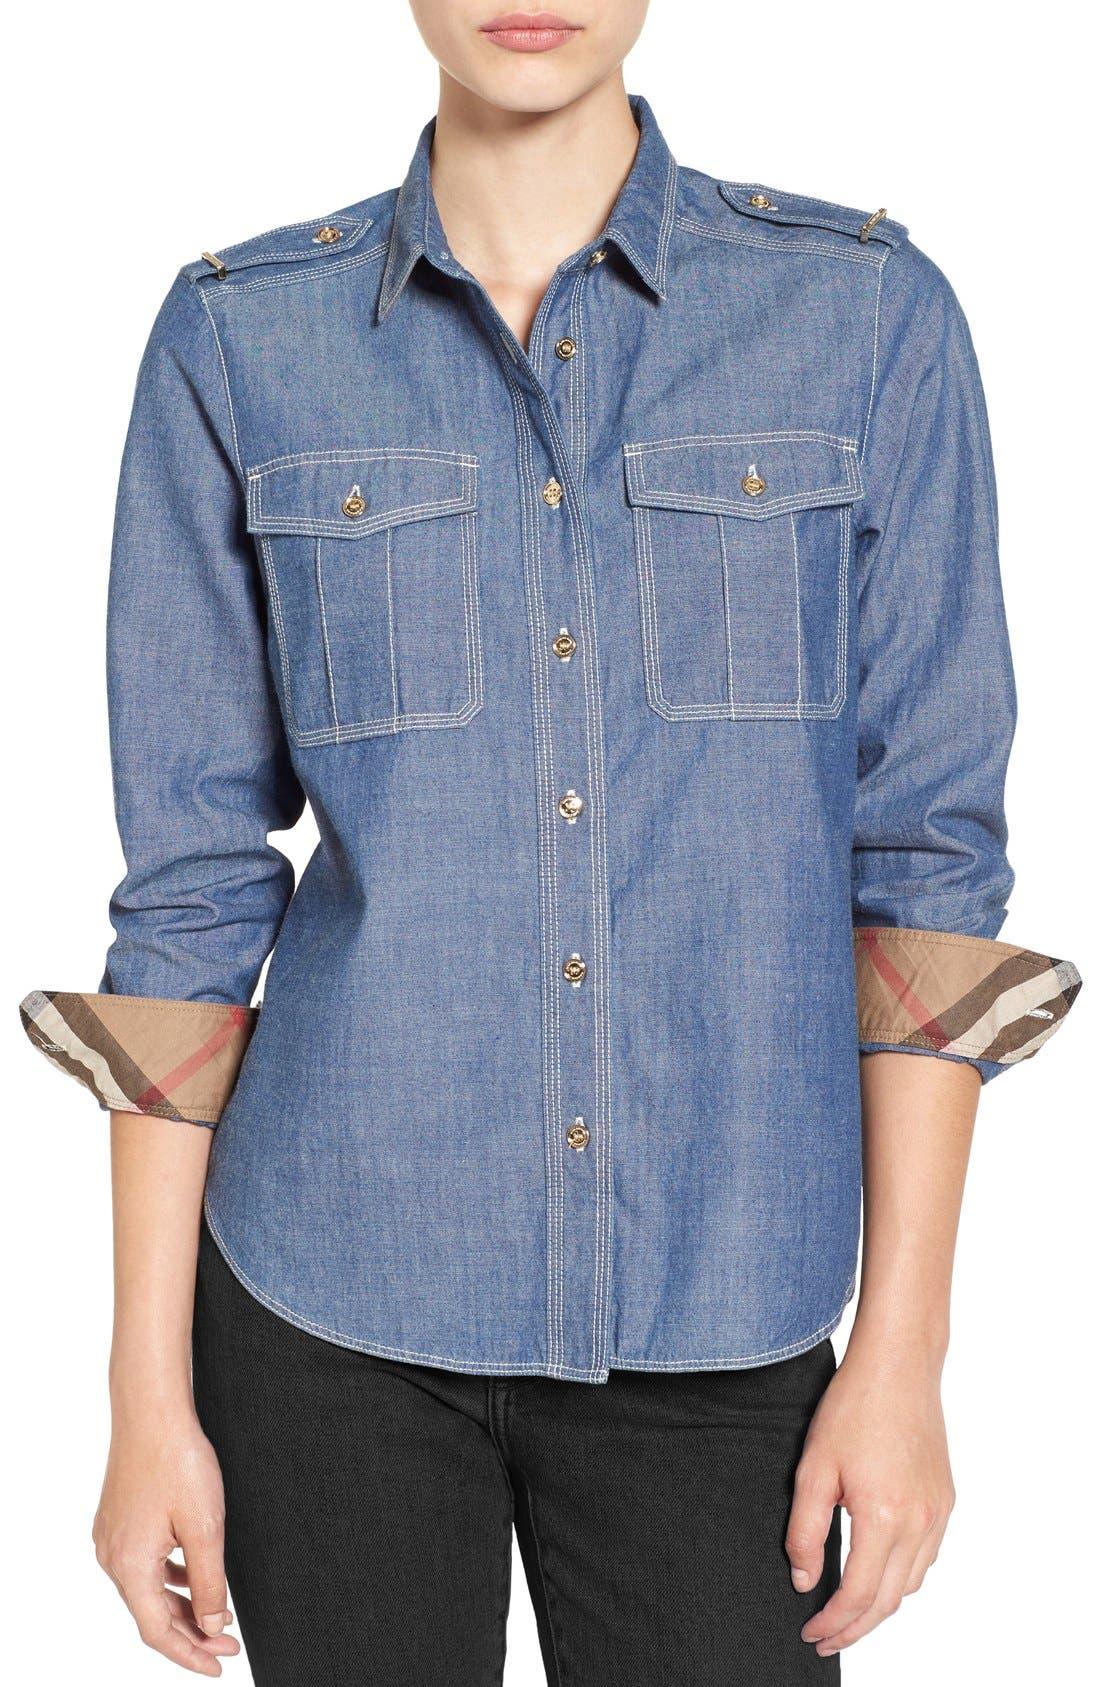 Alternate Image 1 Selected - Burberry Check Cuff Denim Shirt